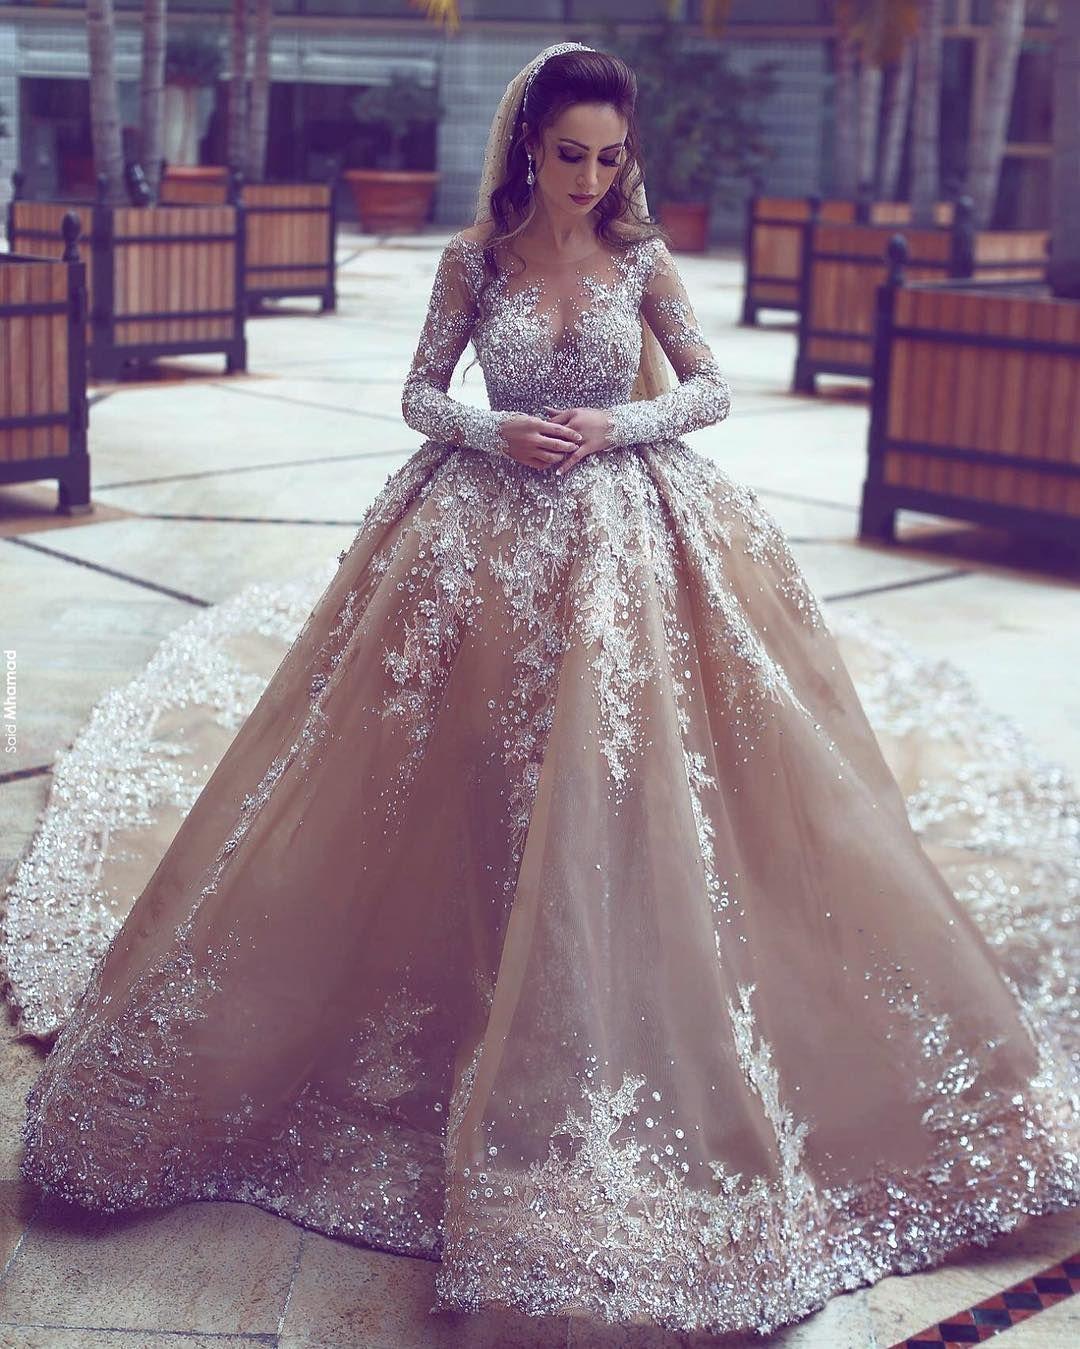 Pin de Lara Veronica en bridal woow | Pinterest | Vestidos de novia ...